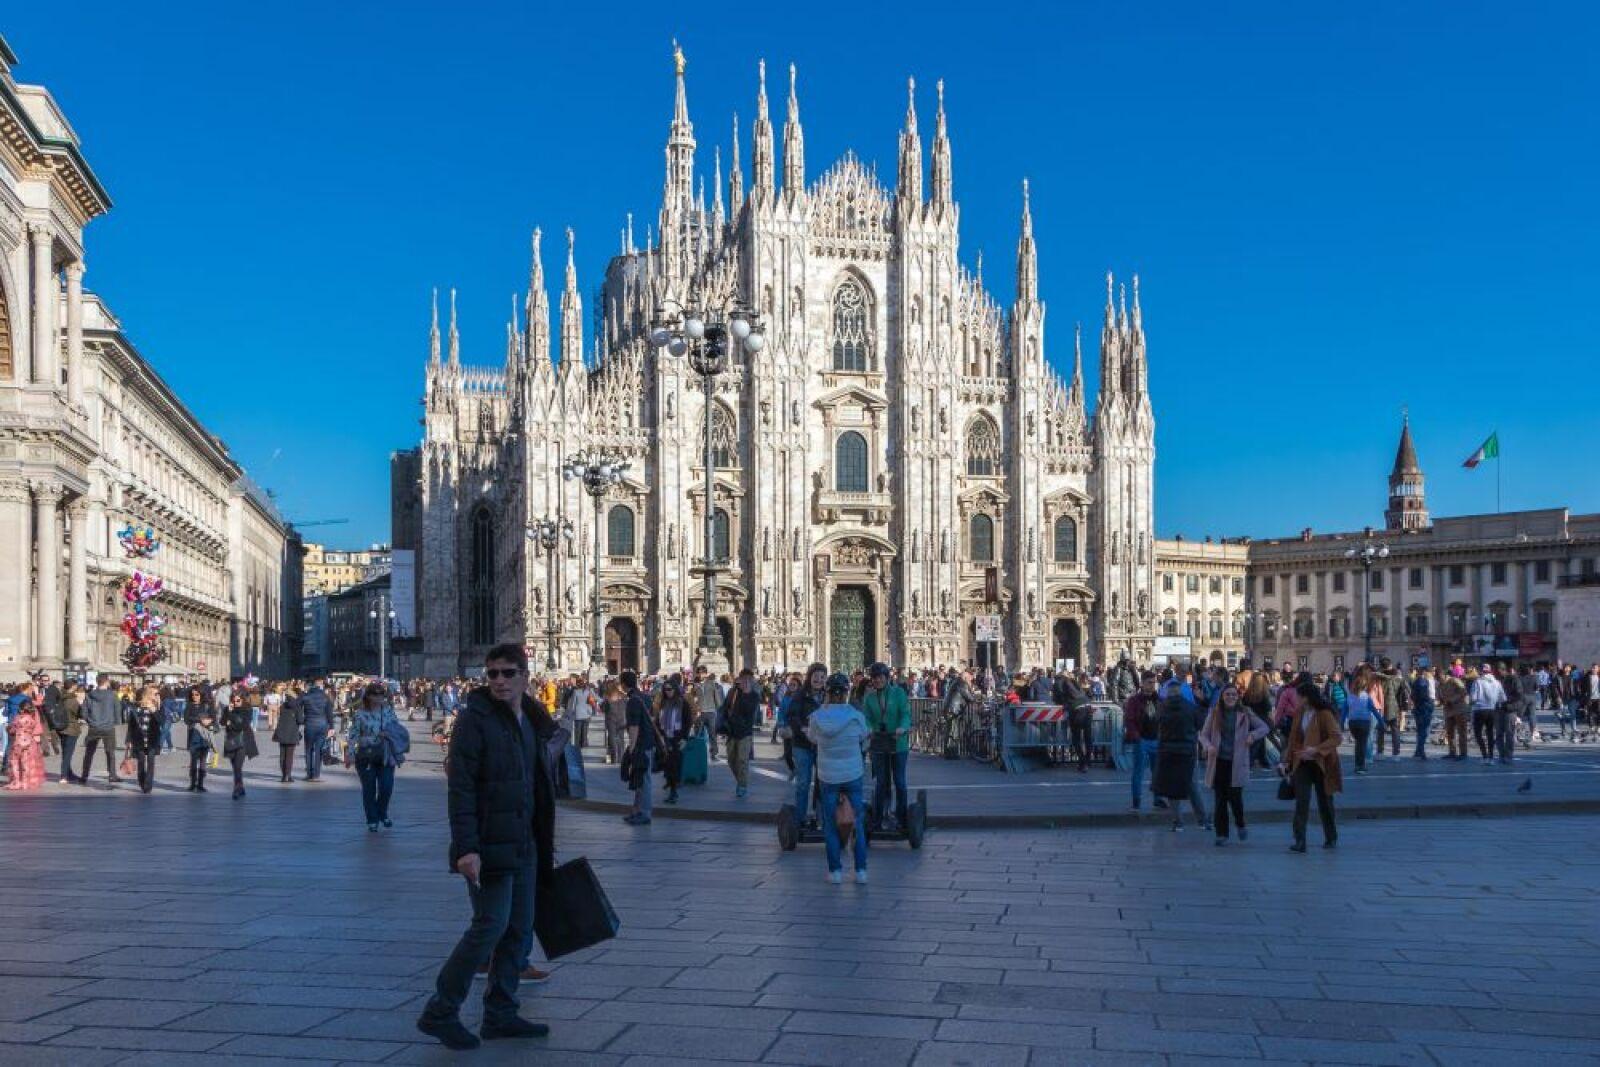 Piazza Duomo 1.JPG